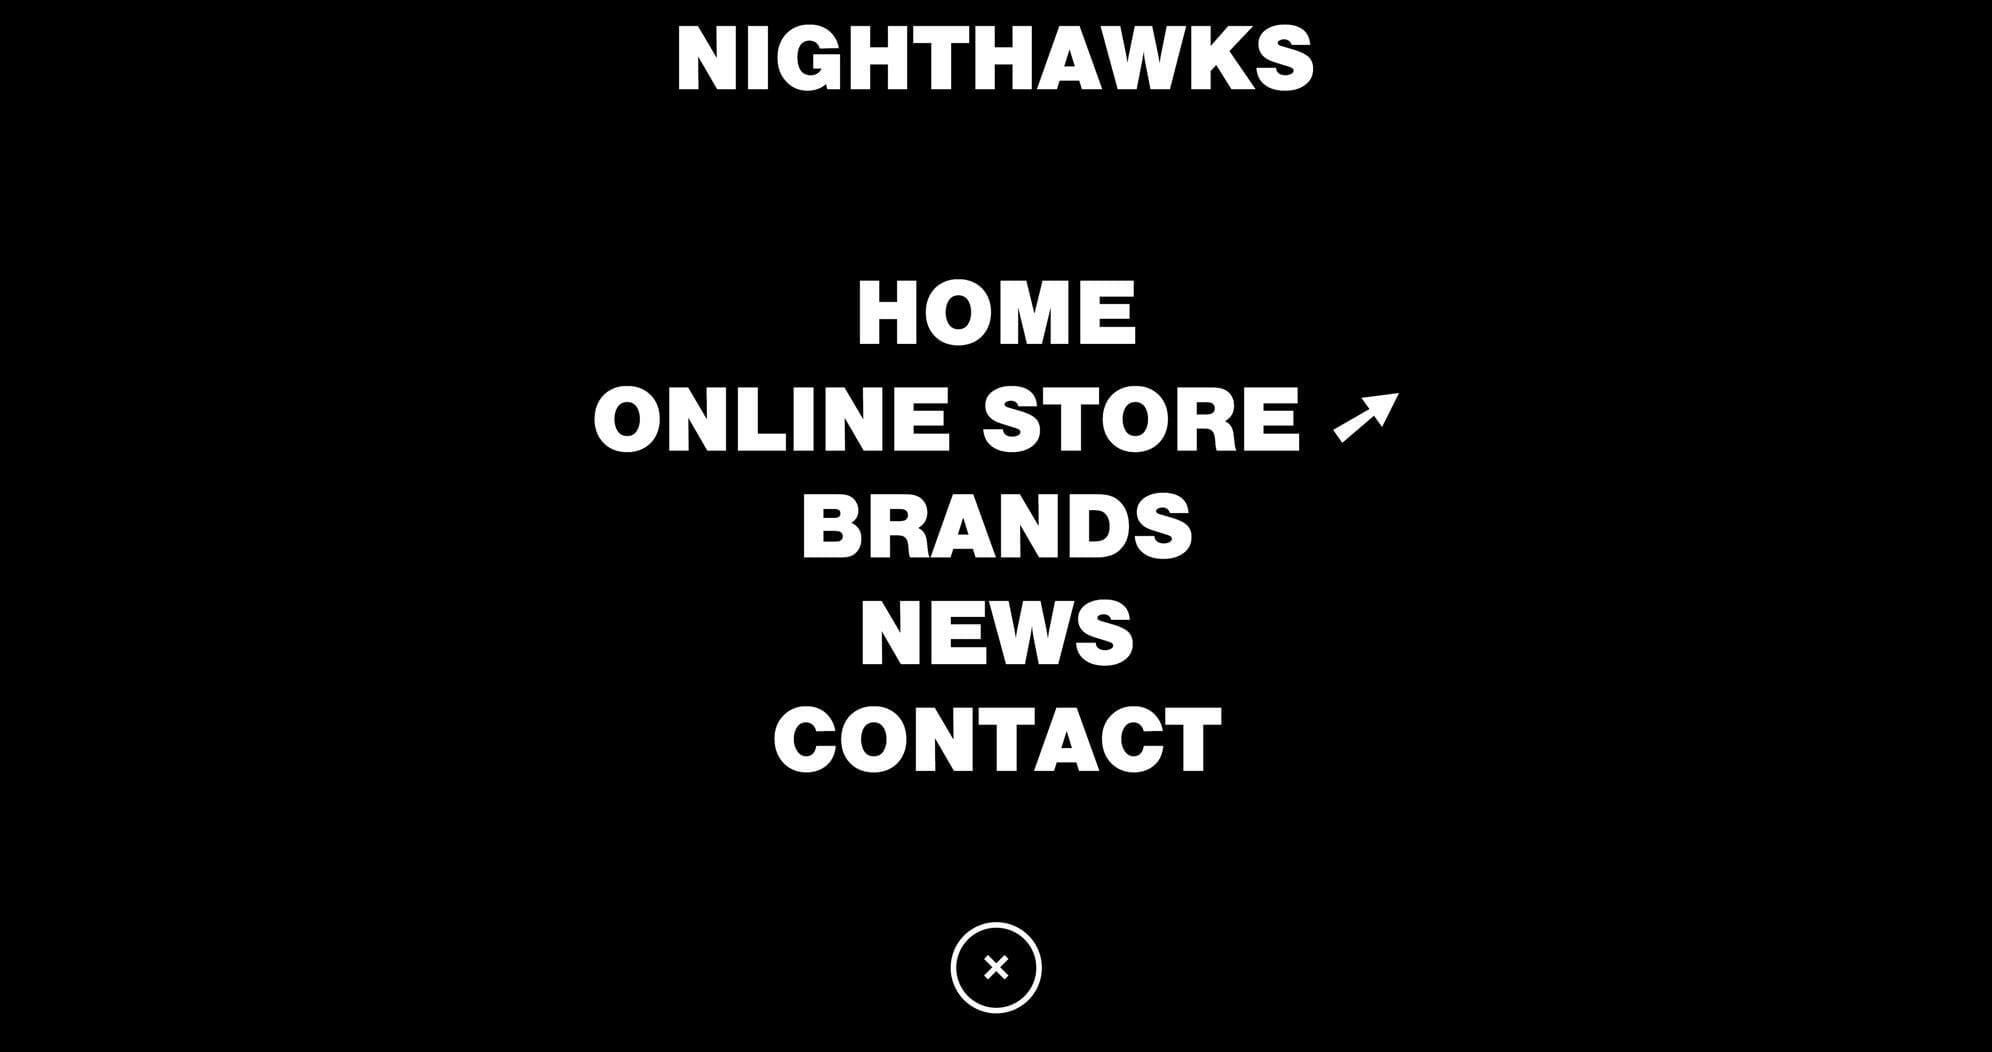 dazze-nighthawks-idea-003